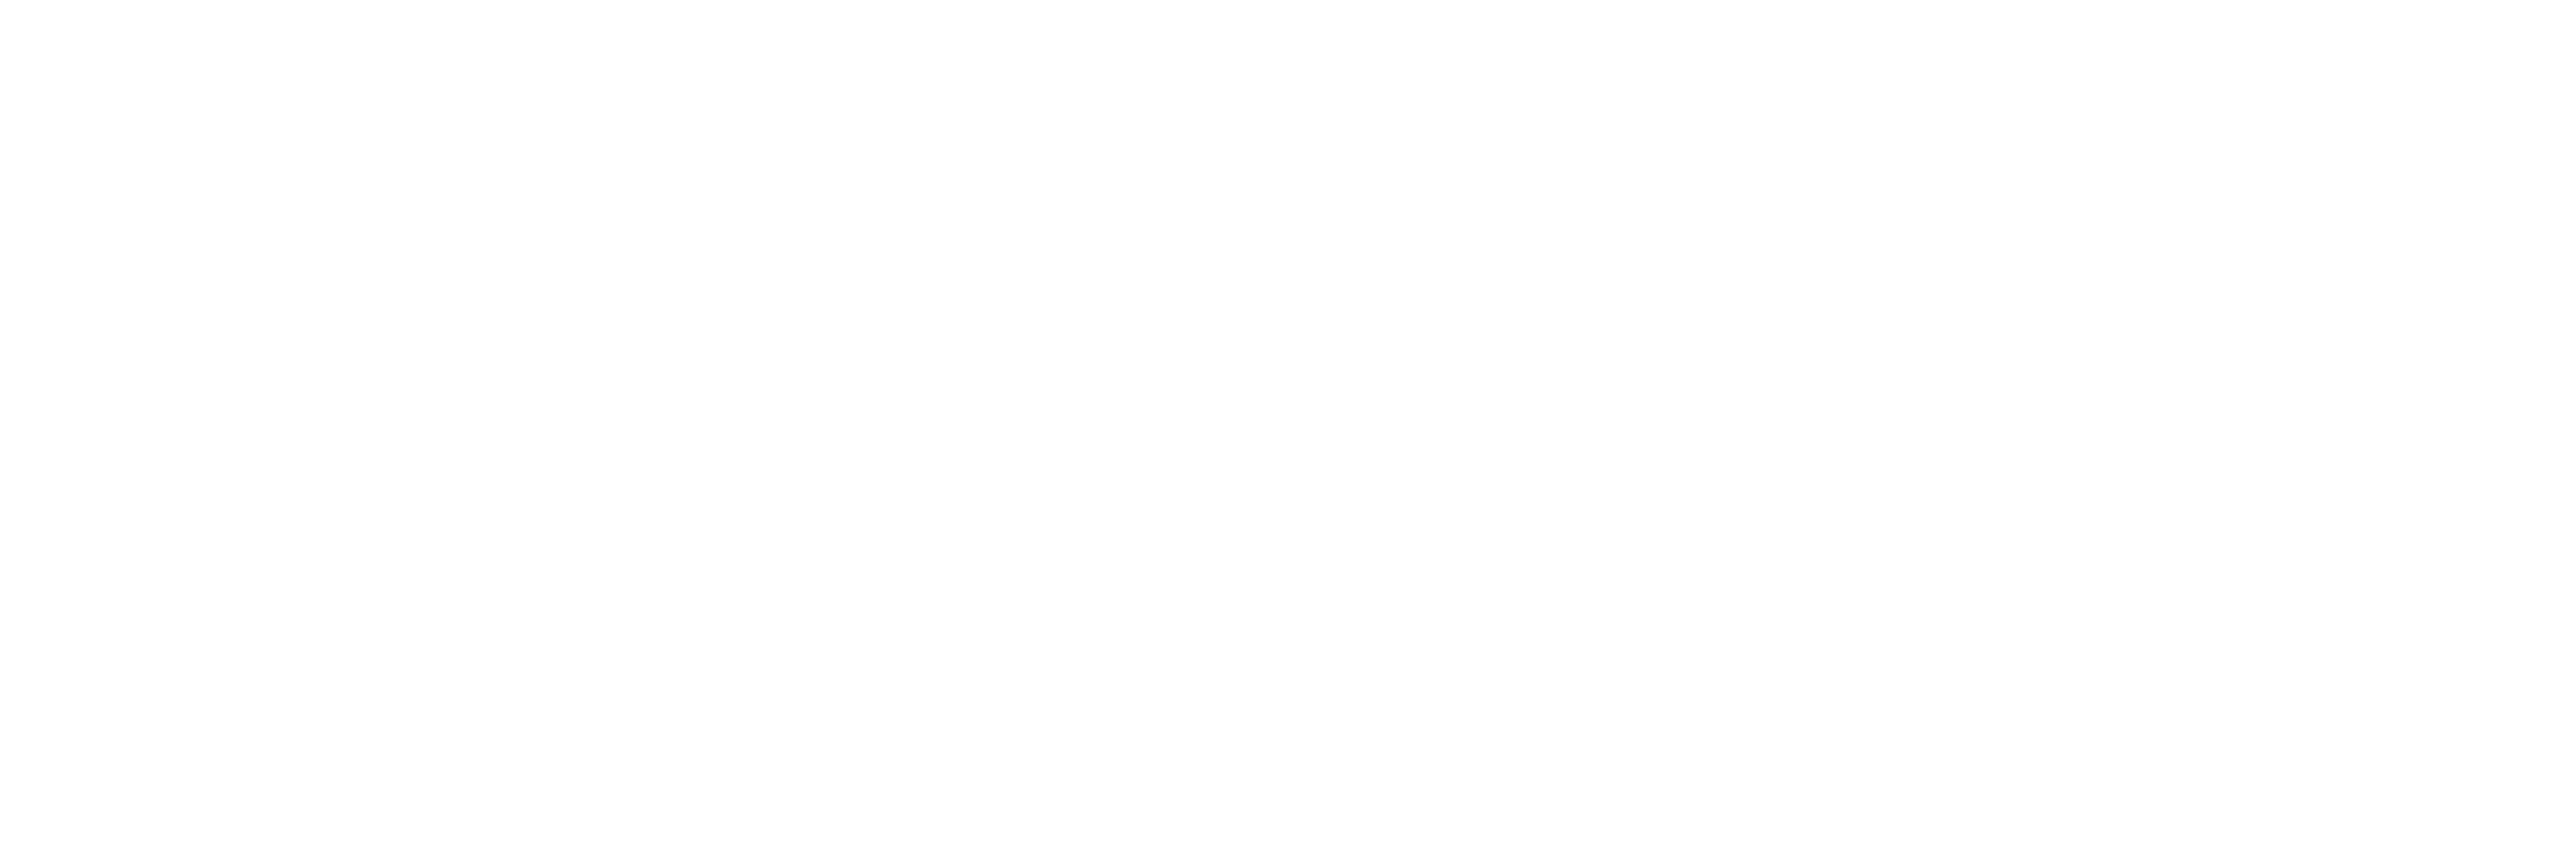 ACTIVATE COMMUNITIES